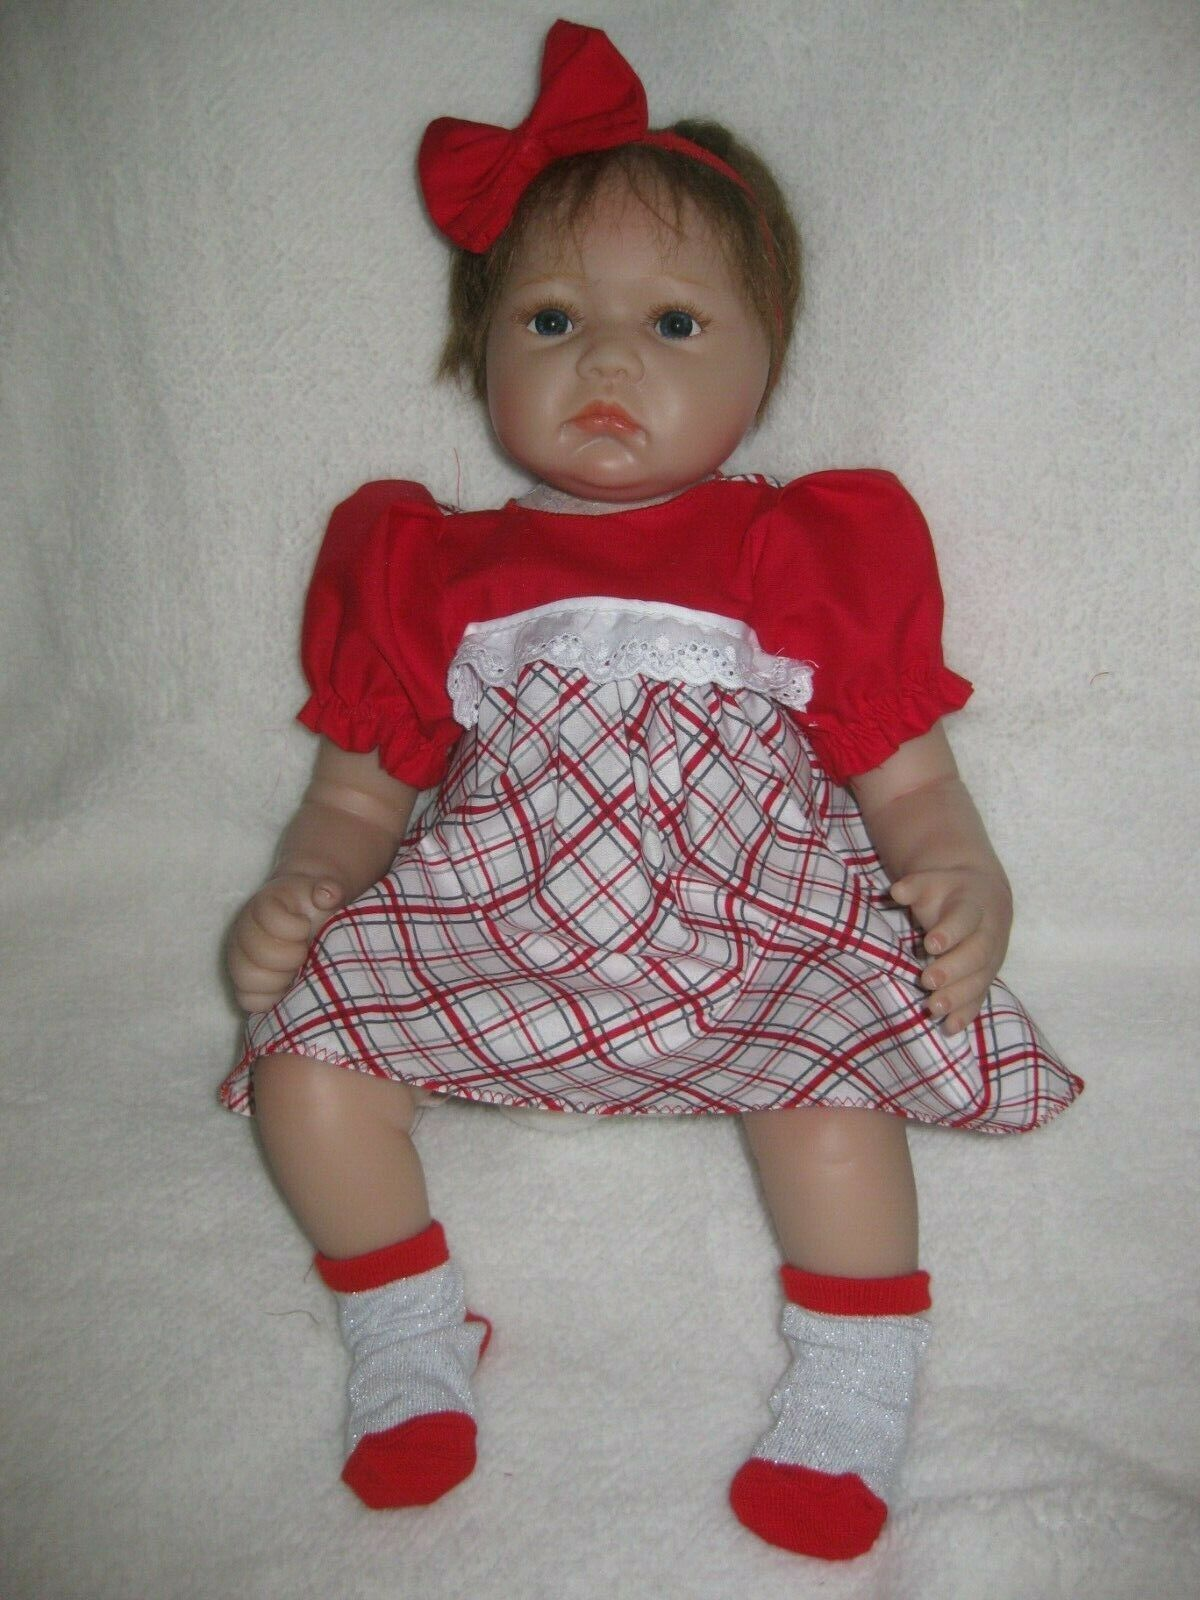 Купить 20-22 inch Reborn doll clothes/red/plaid dress/headband/socks